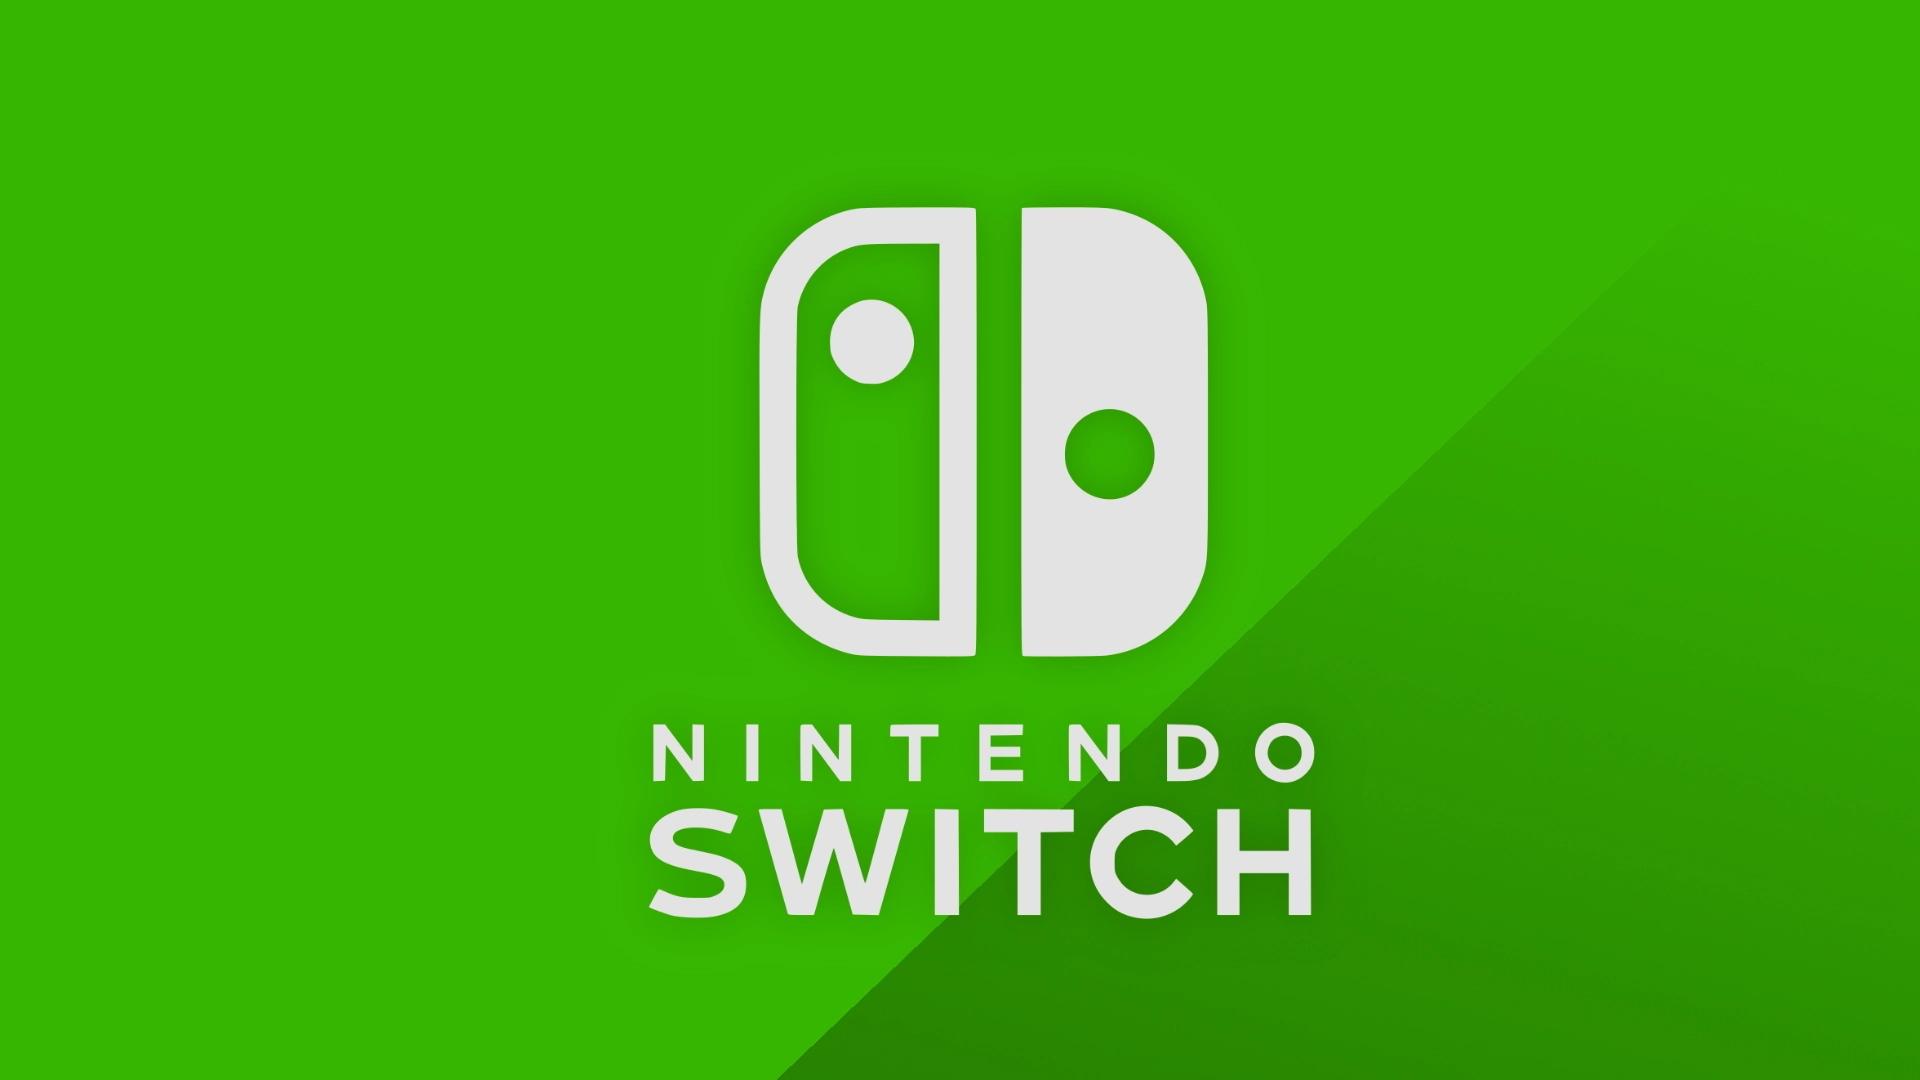 Nintendo Switch verde